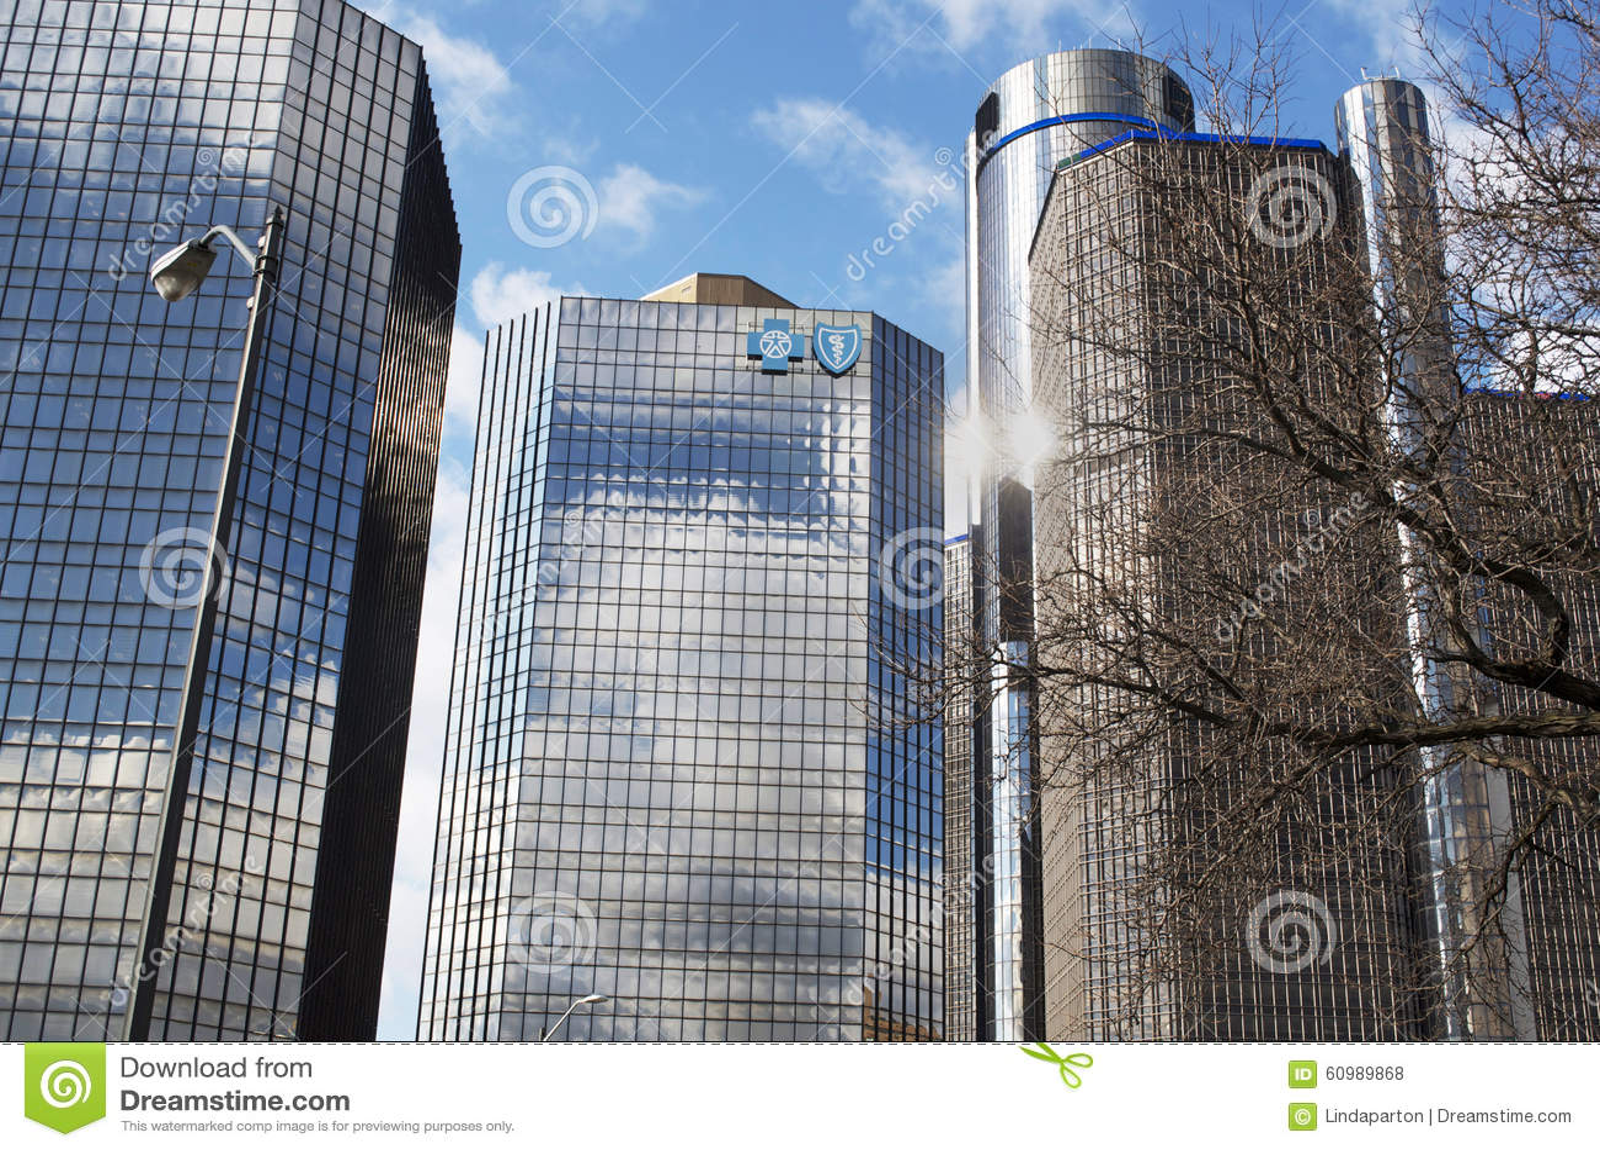 blue cross blue shield building in detroit bluecross blueshield office building architecture